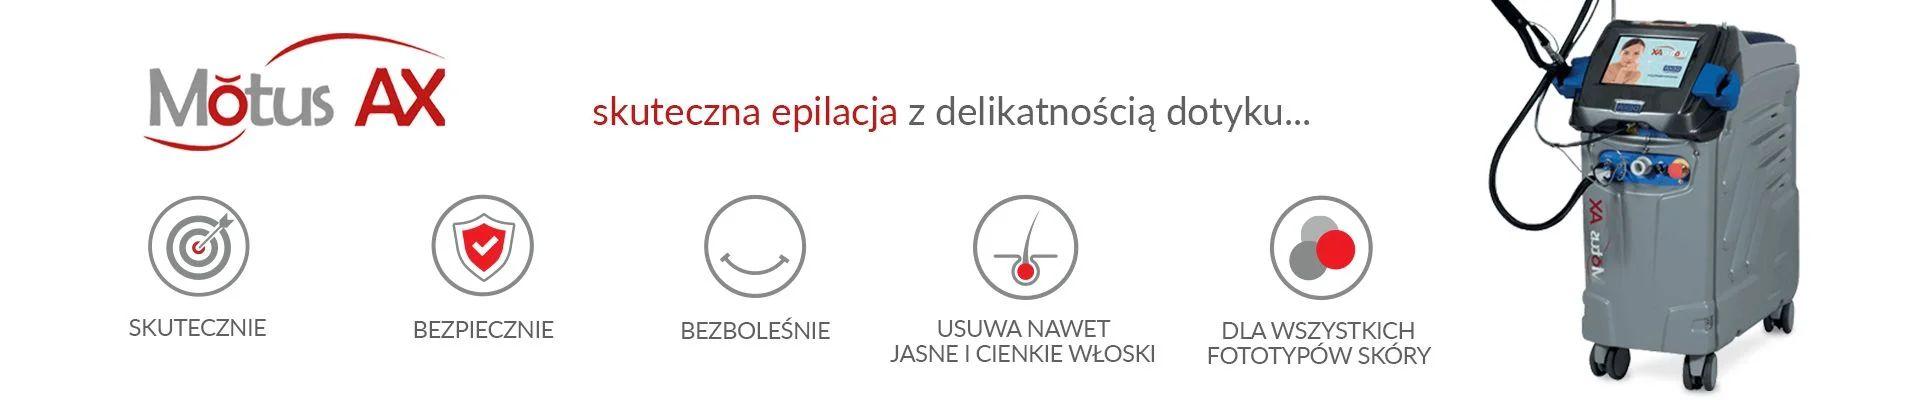 Depilacja laserowa Warszawa laser Motus AX Revival Clinic Wilanów